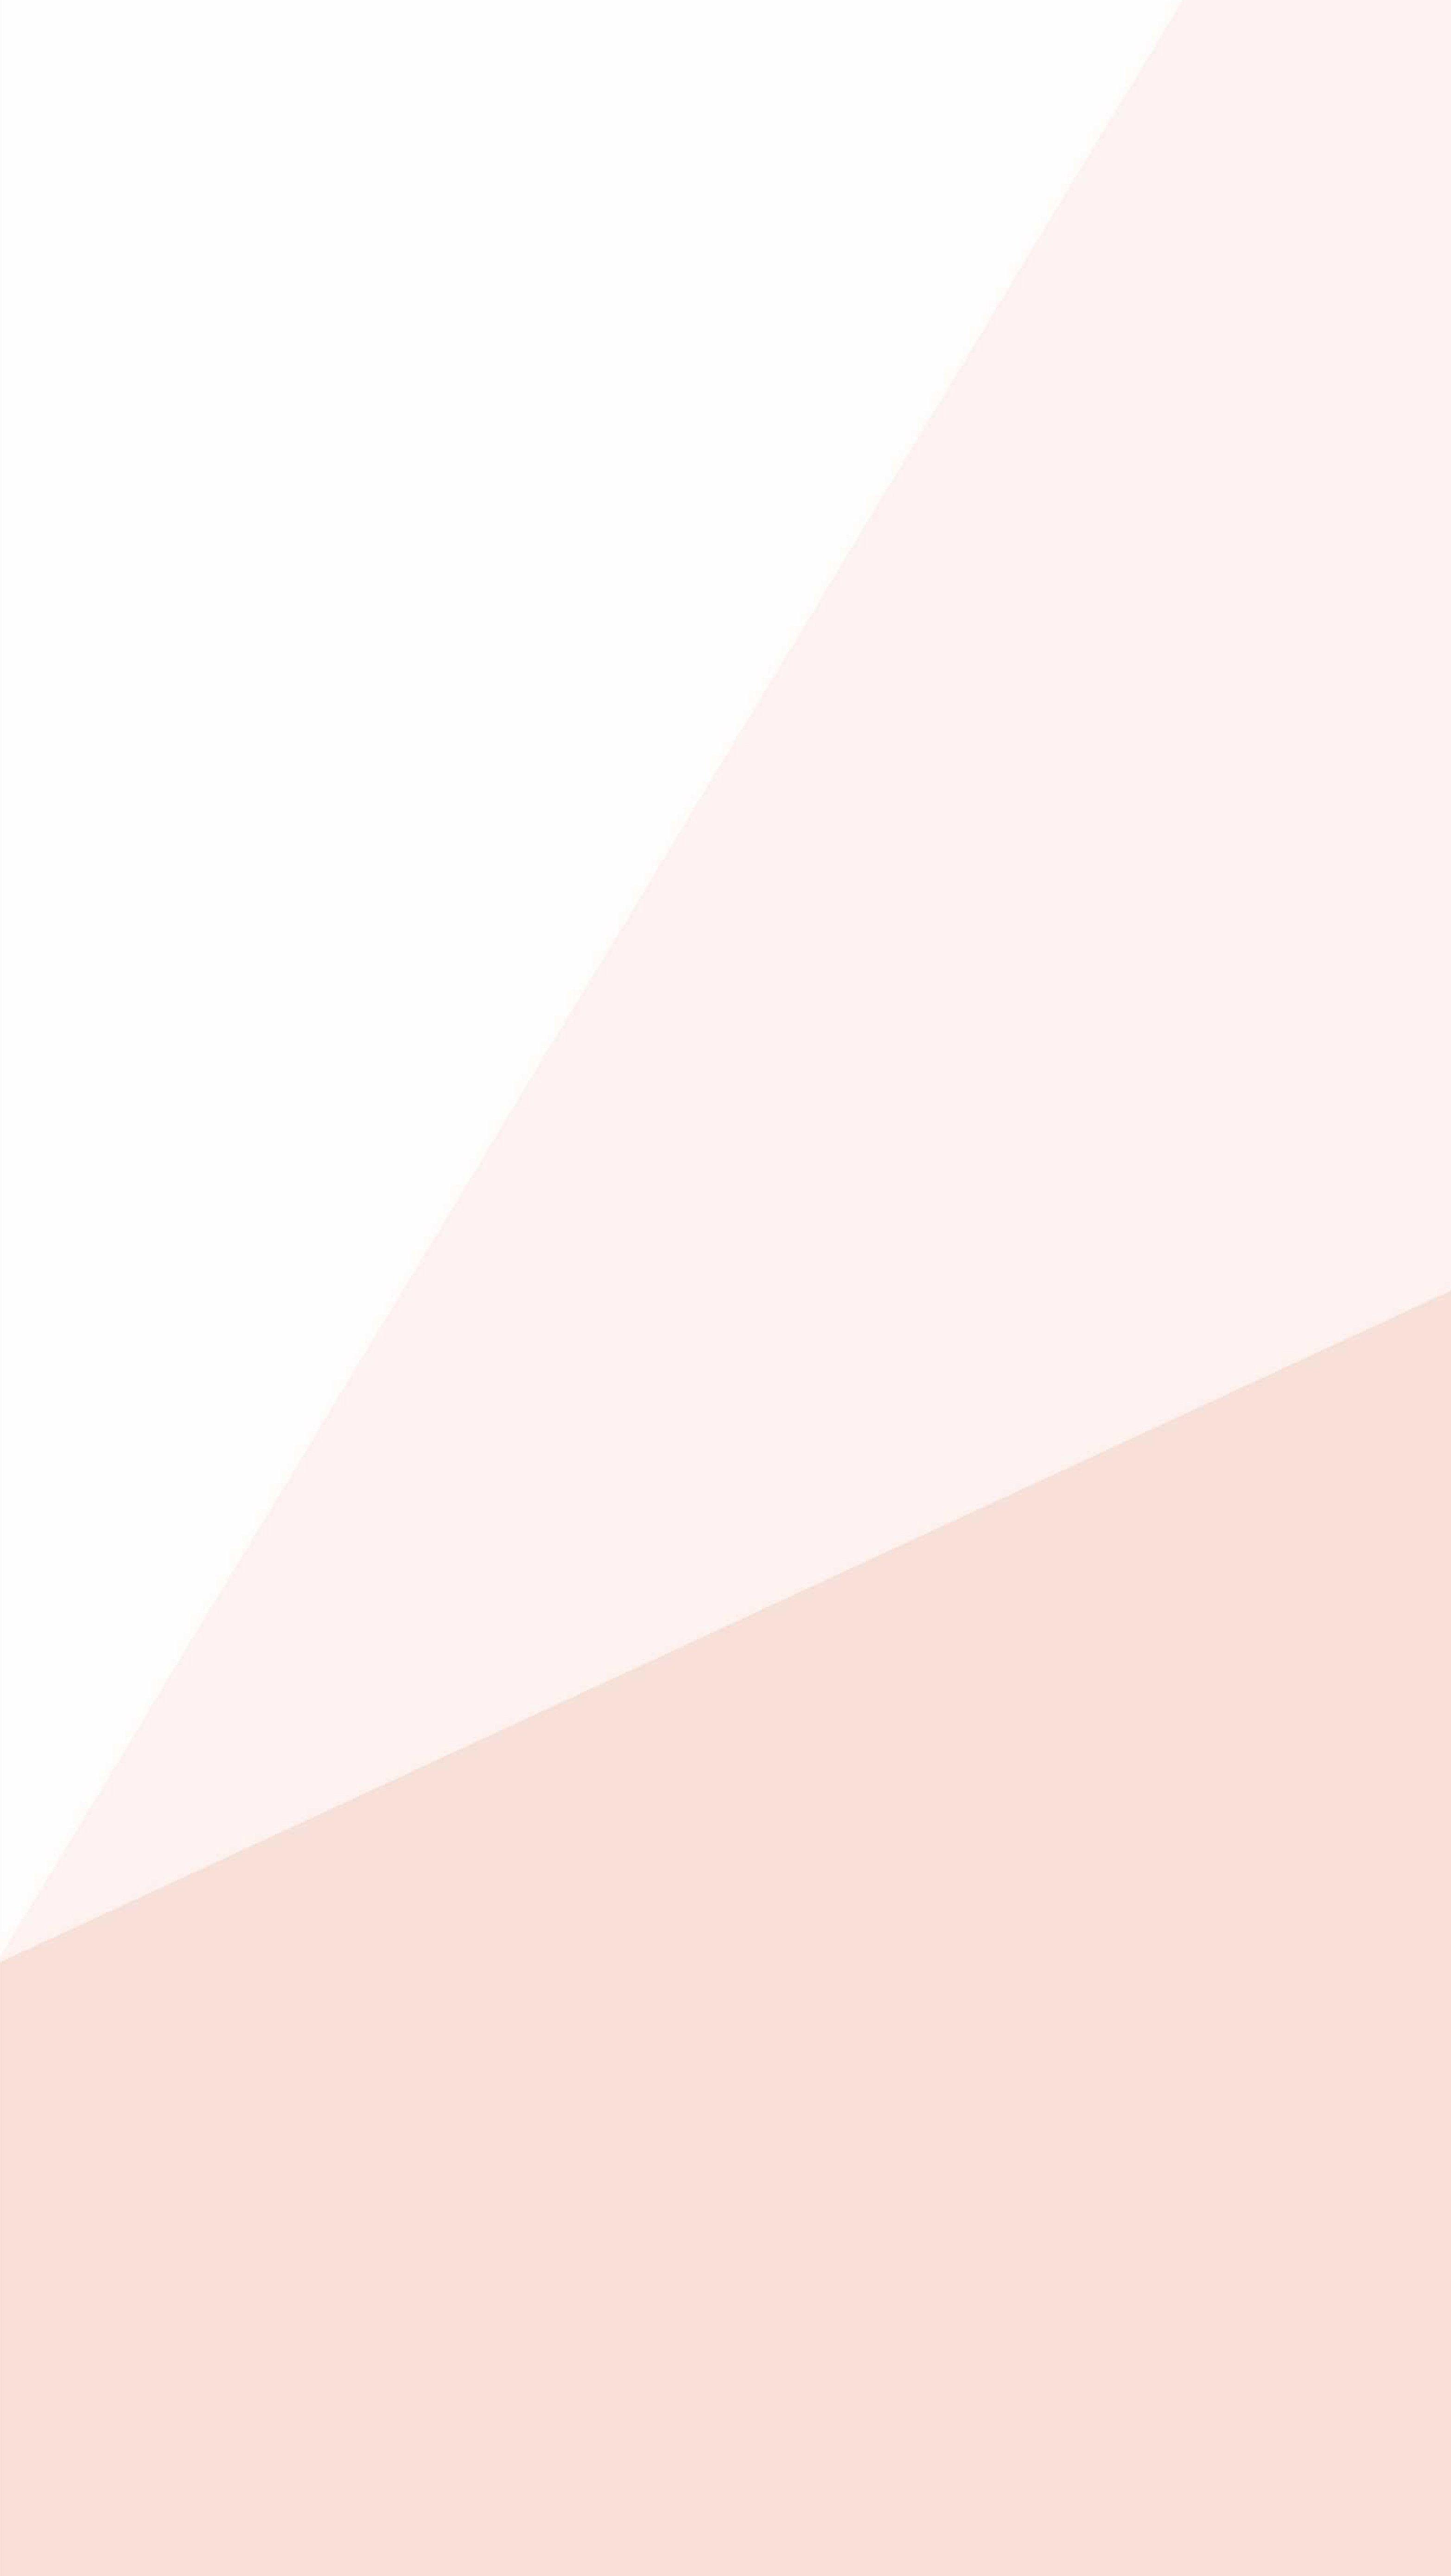 Arvo Be Good Do Good Arvowear Arvowear Pink Iphone Background Wallp Plain Wallpaper Iphone Pastel Background Wallpapers Iphone Background Wallpaper